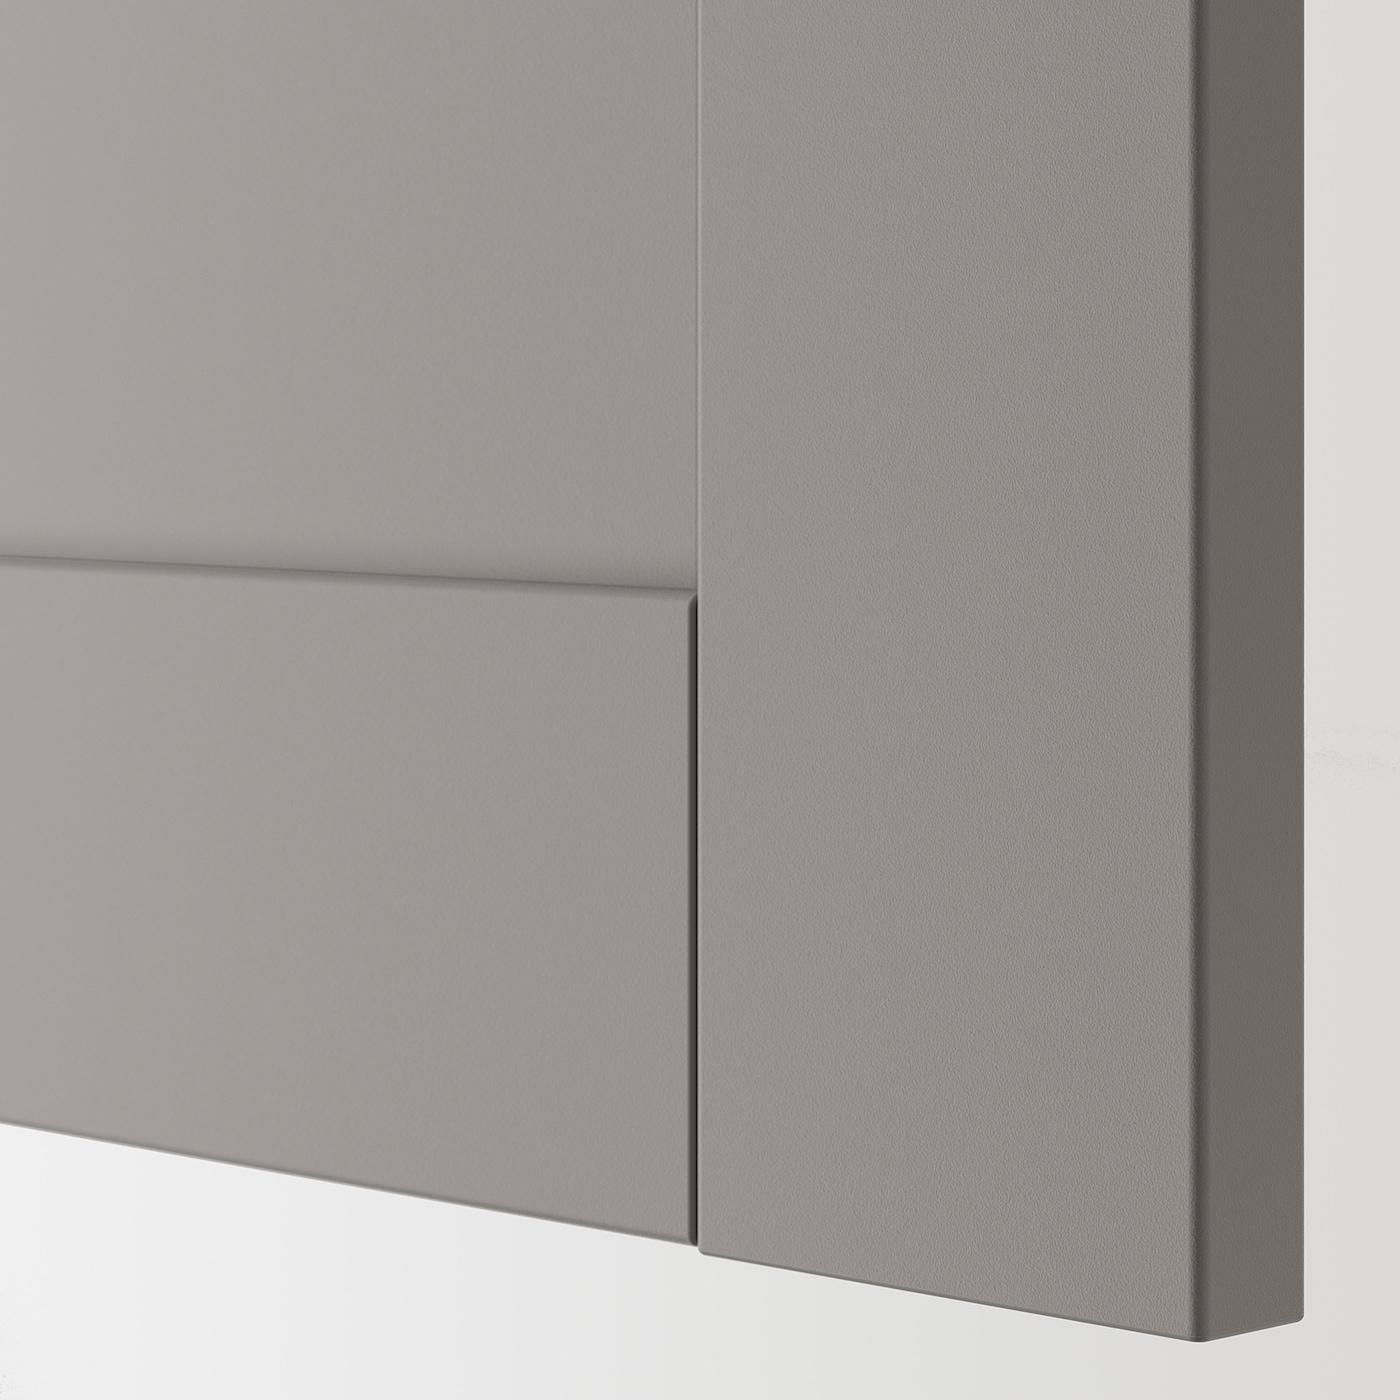 ENHET خزانة حائط مع رف/باب, أبيض/رمادي هيكل, 60x32x60 سم